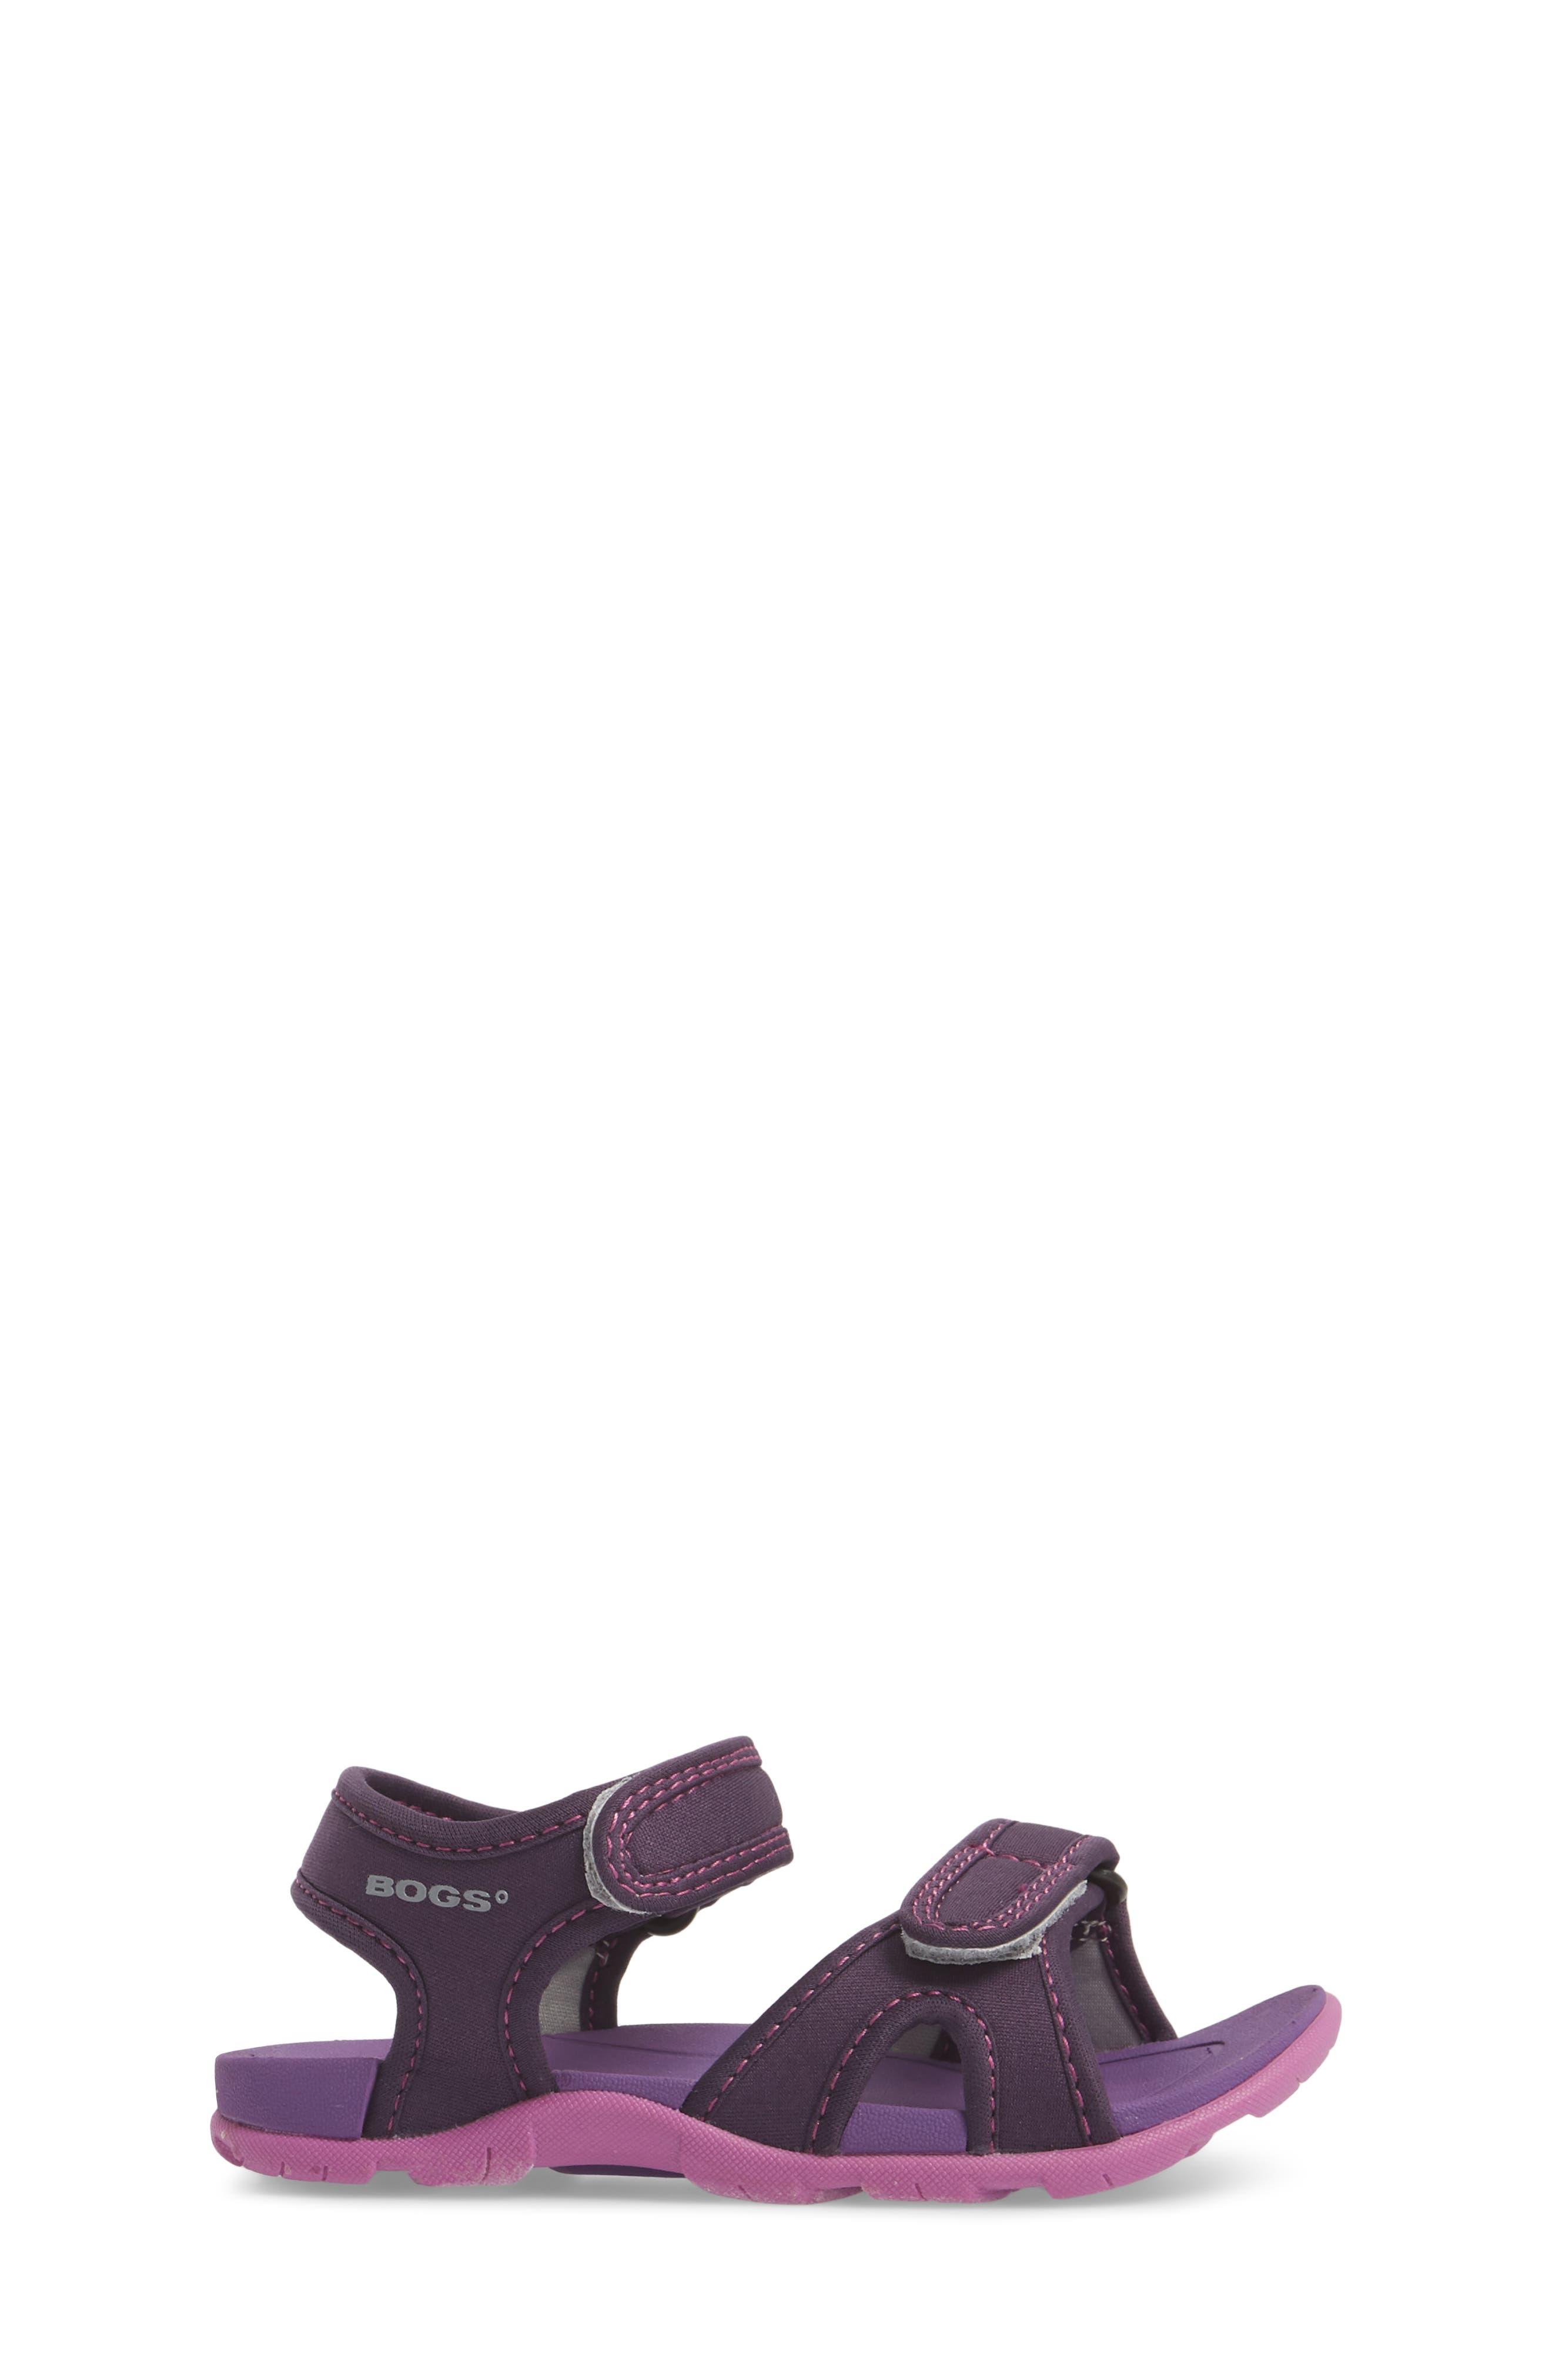 Whitefish Waterproof Sandal,                             Alternate thumbnail 3, color,                             551